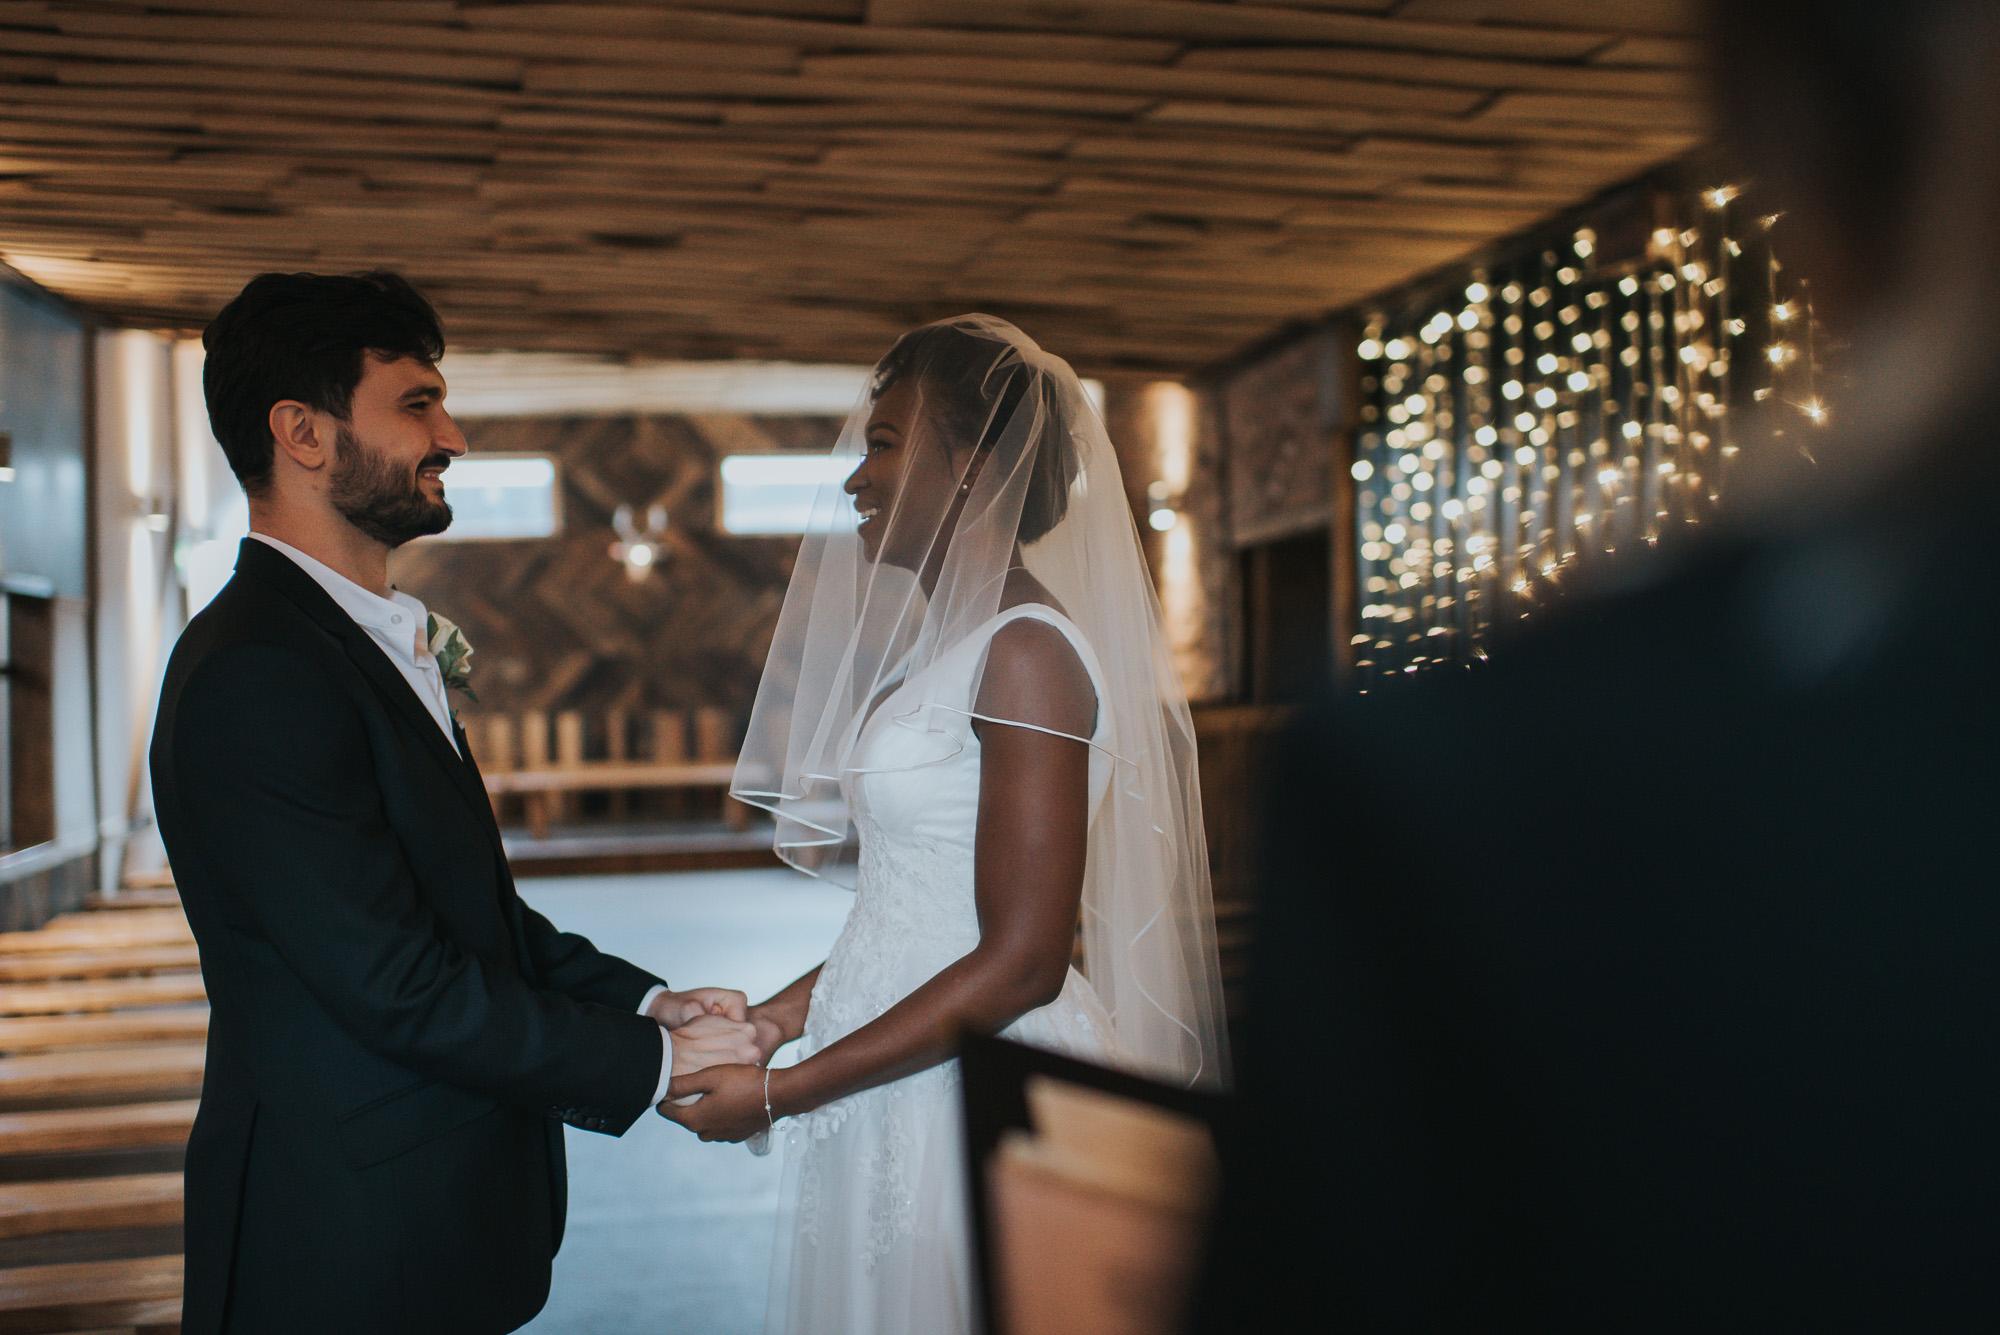 Owen HOuse Wedding Barn WEdding Photographer cheshire adam joe roberts photography (18 of 36).jpg